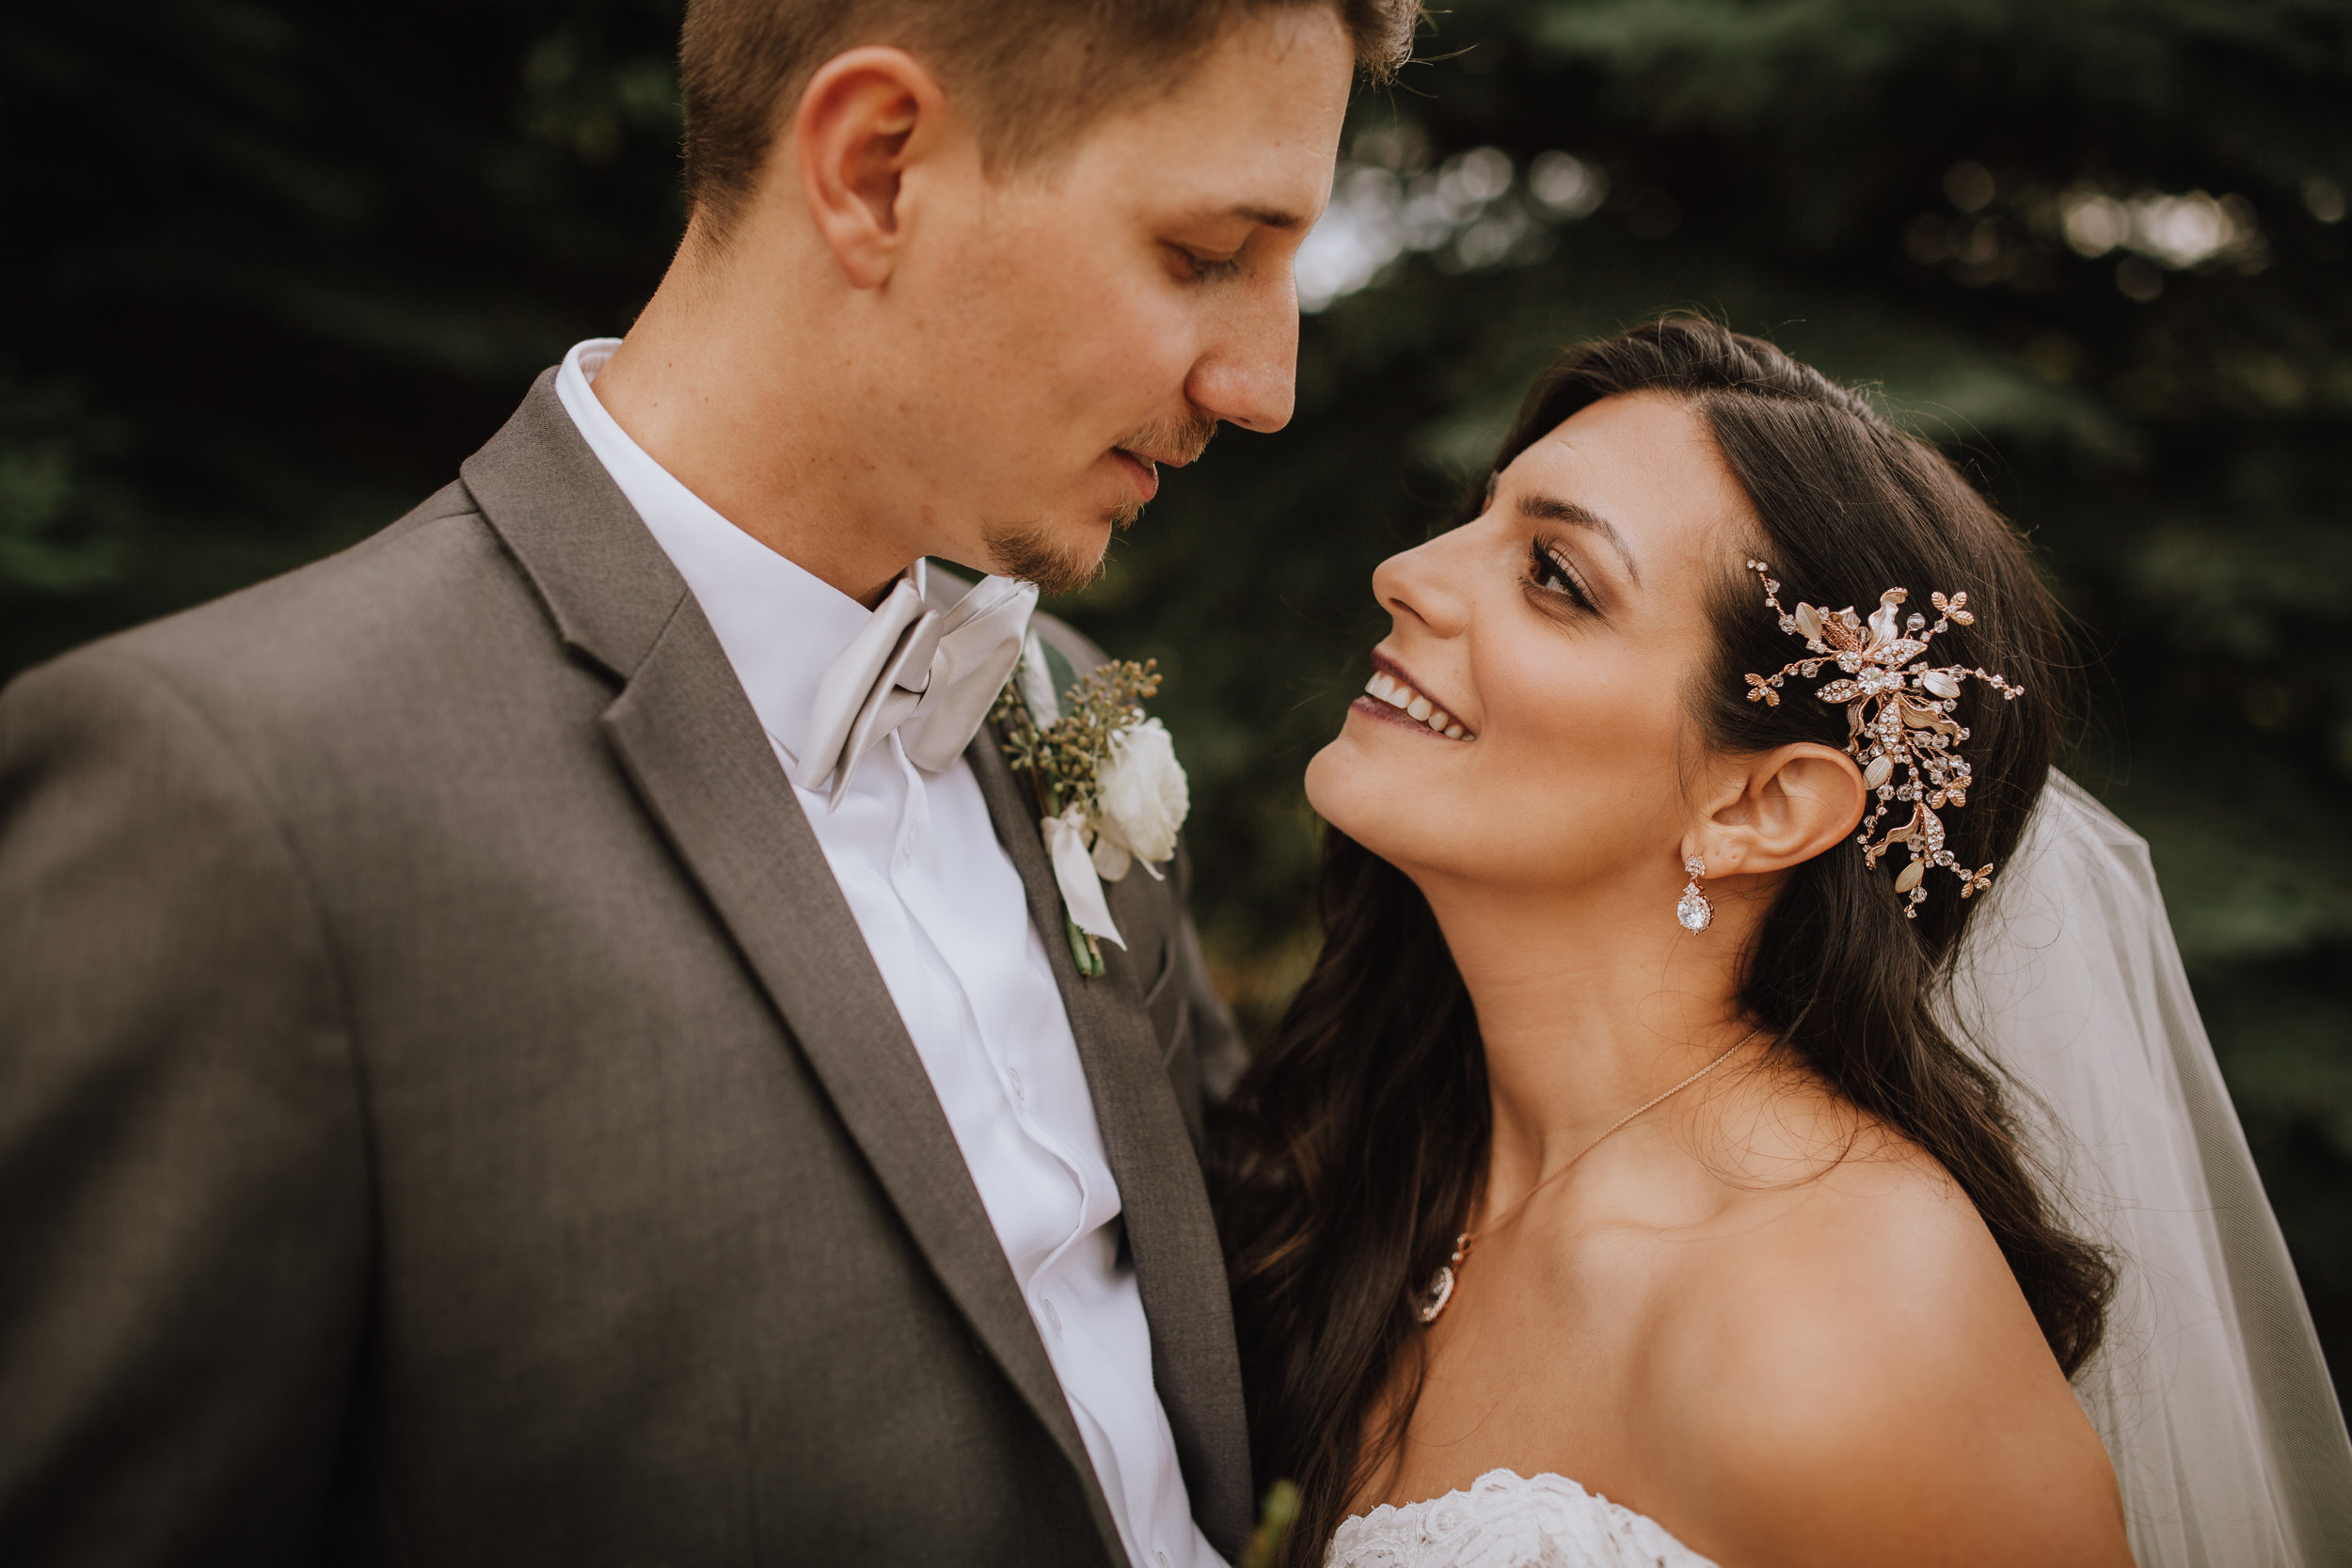 Kurt + Melissa 4 - Bridal Portraits-2.jpg